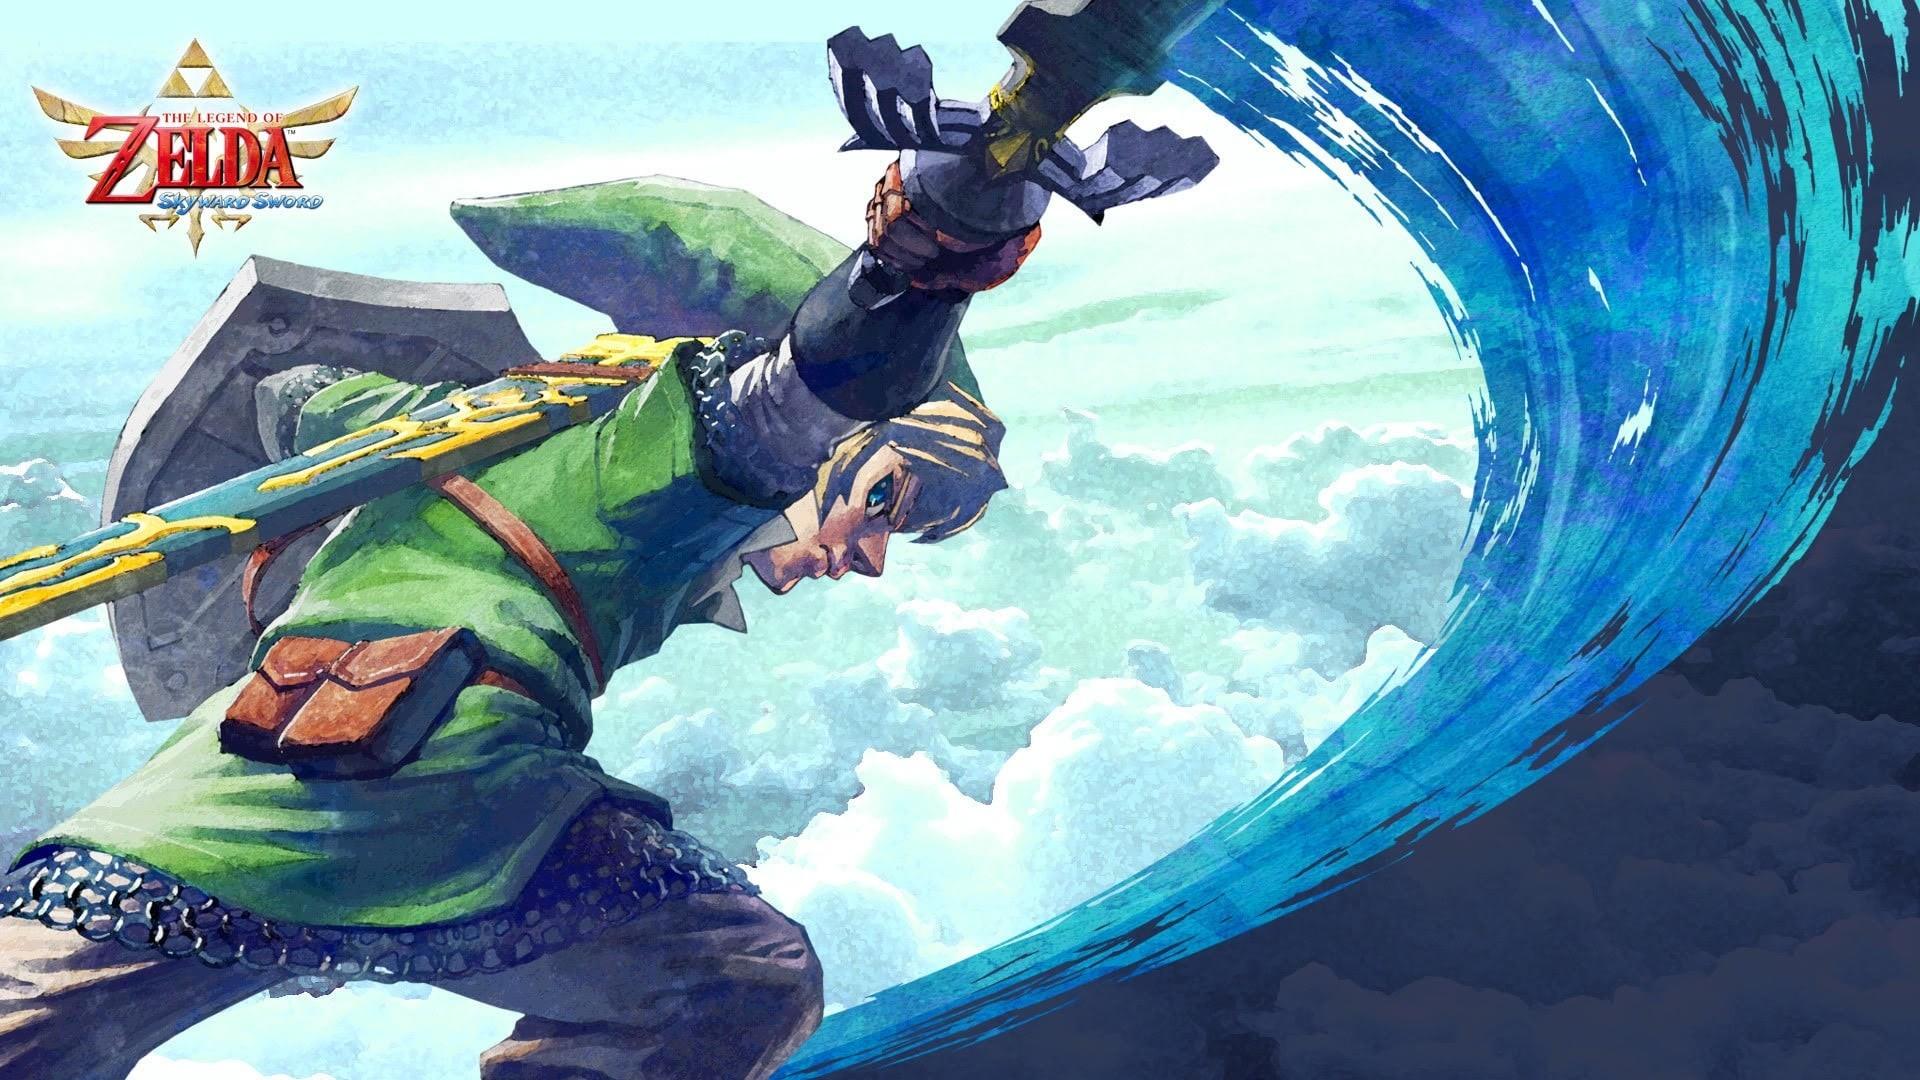 The Legend of Zelda background · Wallpapers Market full HD image